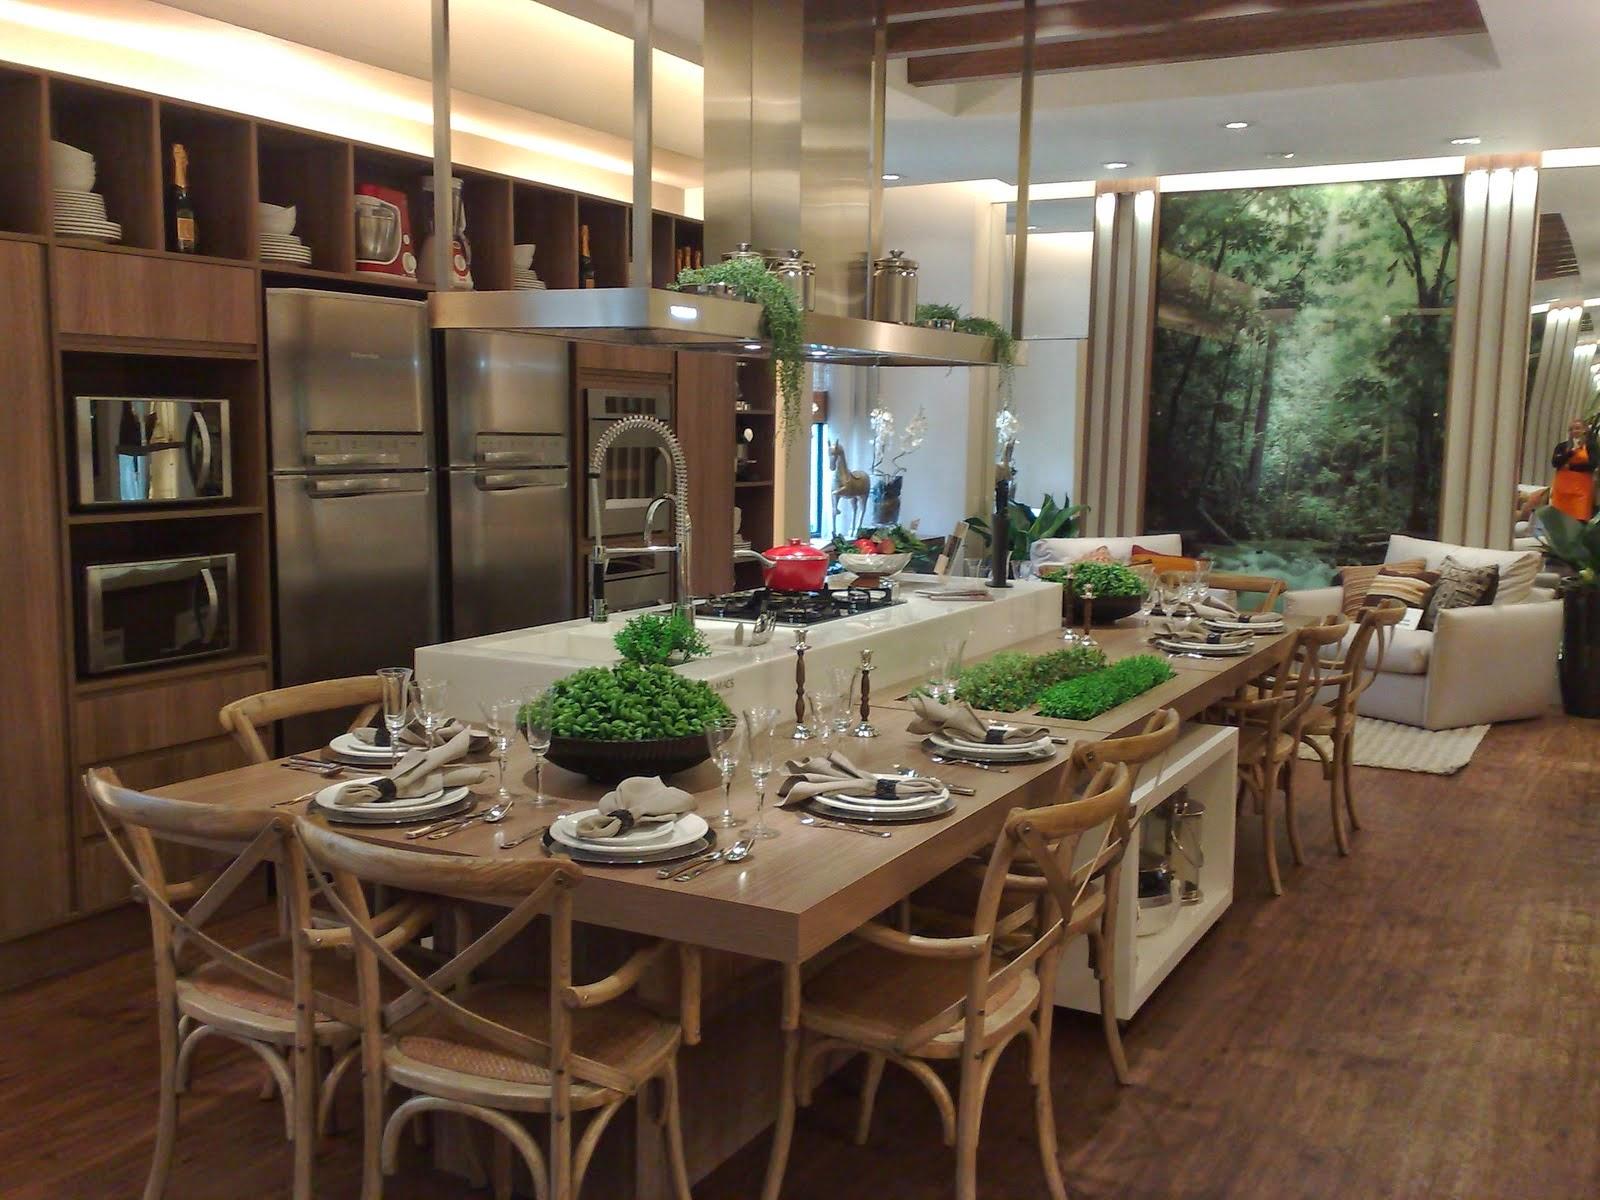 de 1000 ideas sobre Bancada De Cozinha Americana en Pinterest Bancos  #8A7C41 1600 1200